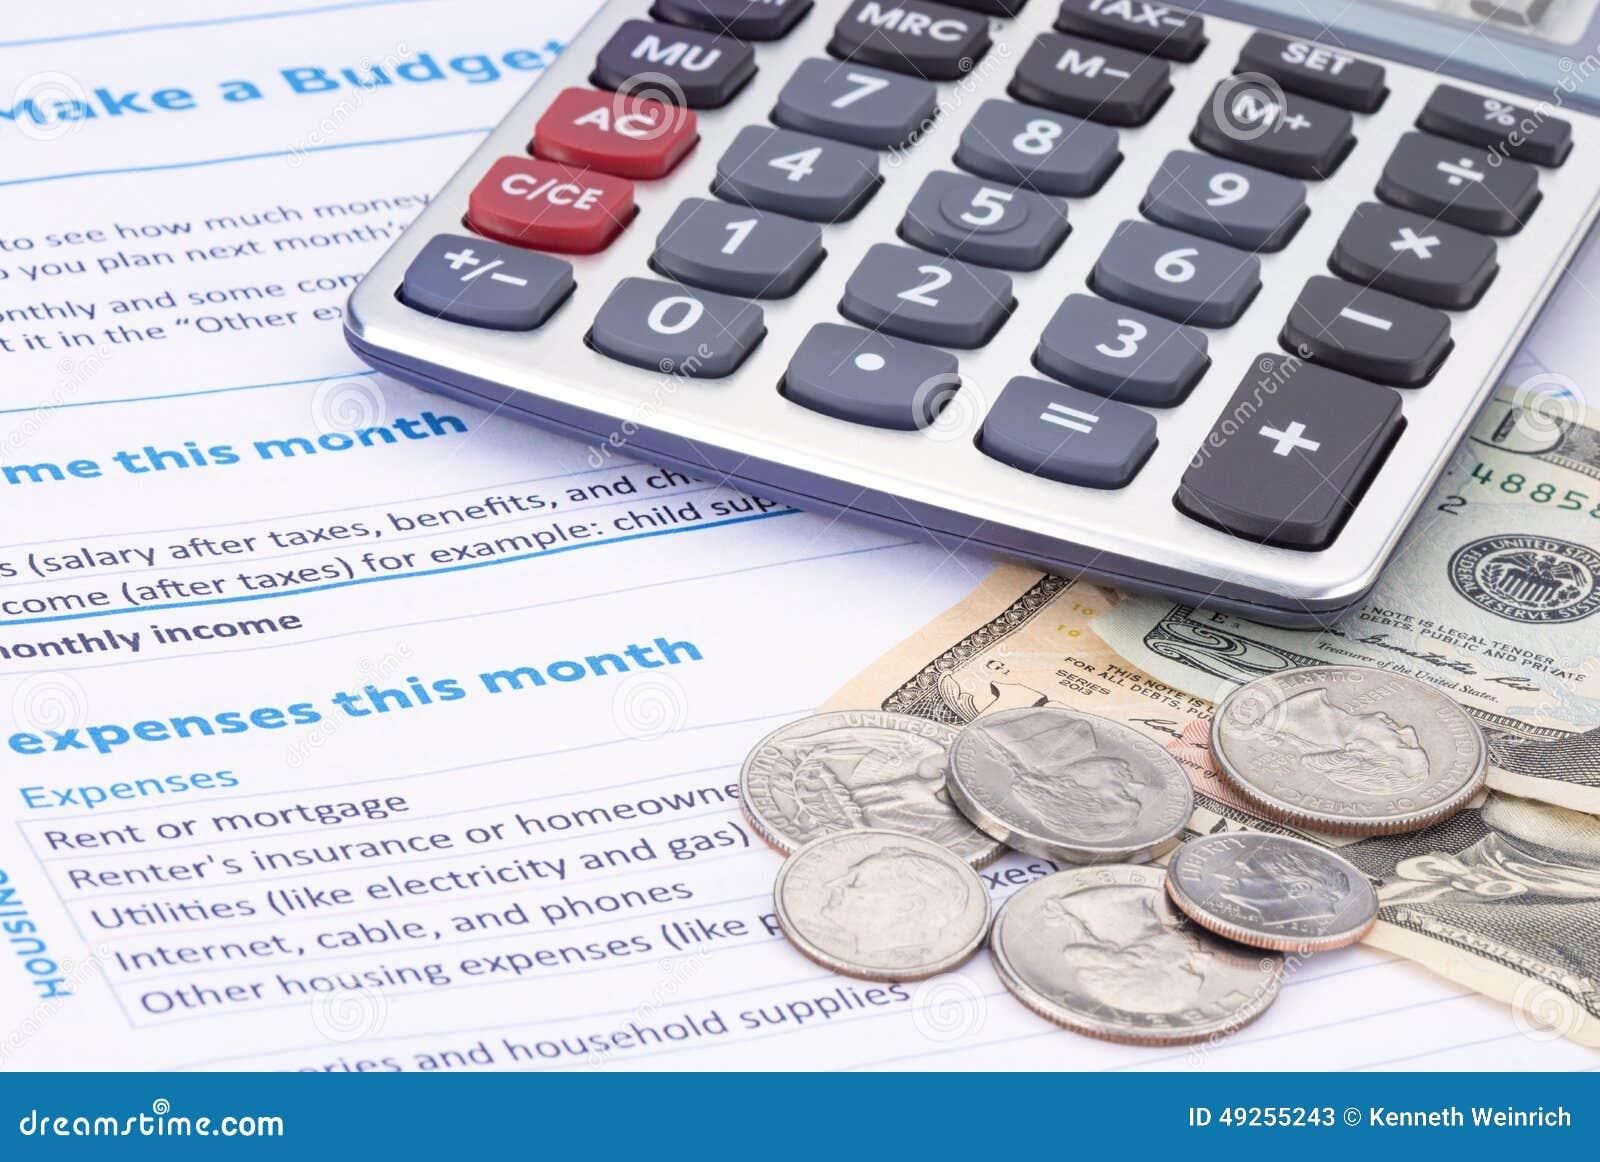 house budget calculator